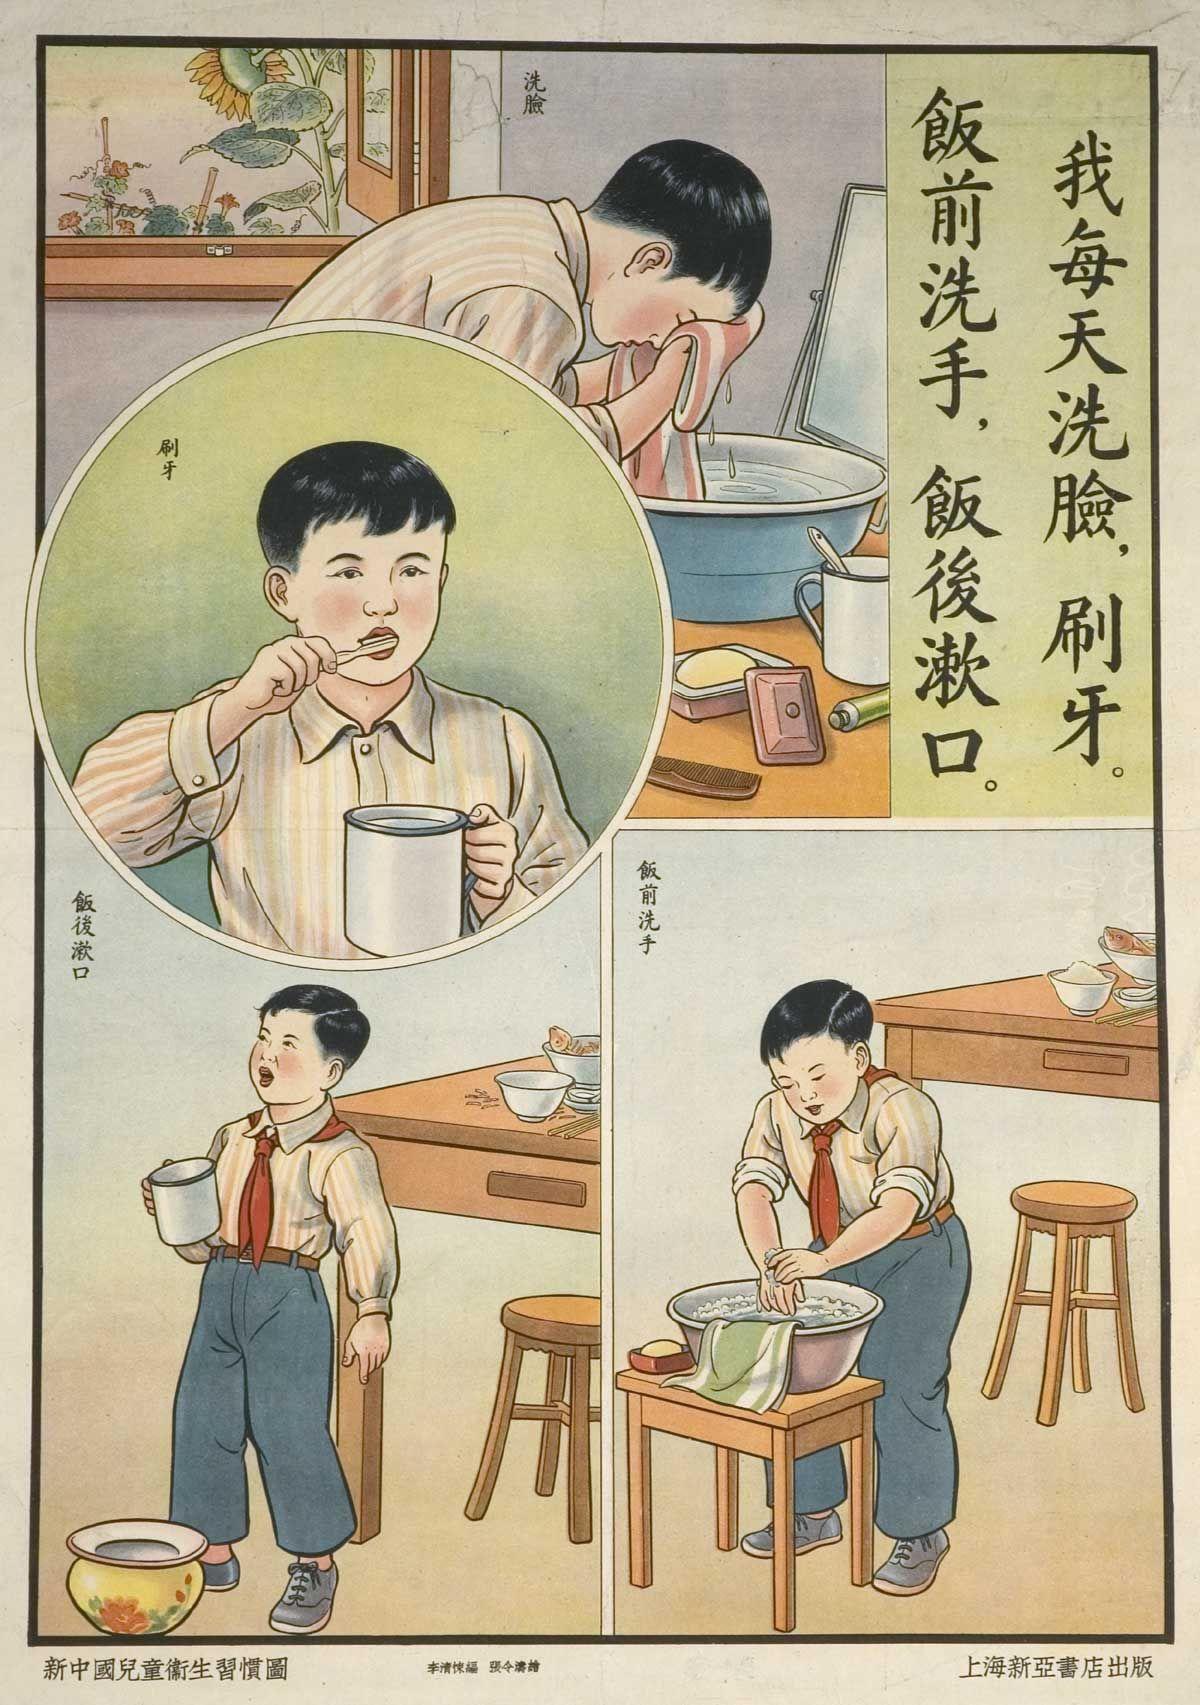 Chinese Hygiene poster circa 1950 http://www.nlm.nih.gov/hmd ...